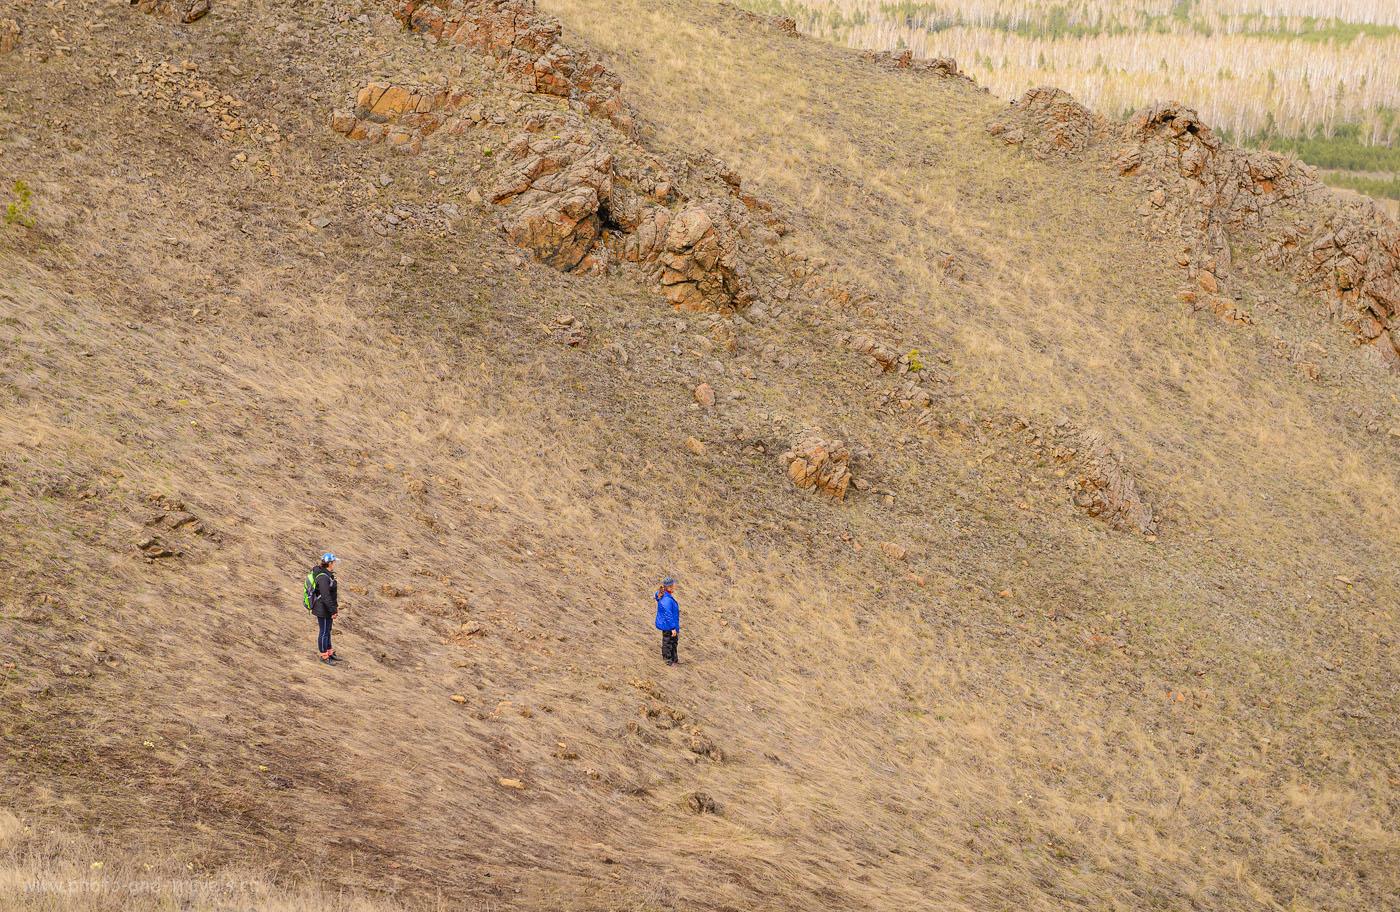 23. Пеший поход в горы Башкирии. Как же там чудесно! Прогулка по хребту Нурали. 1/400, 0.33, 5.6, 250, 66.